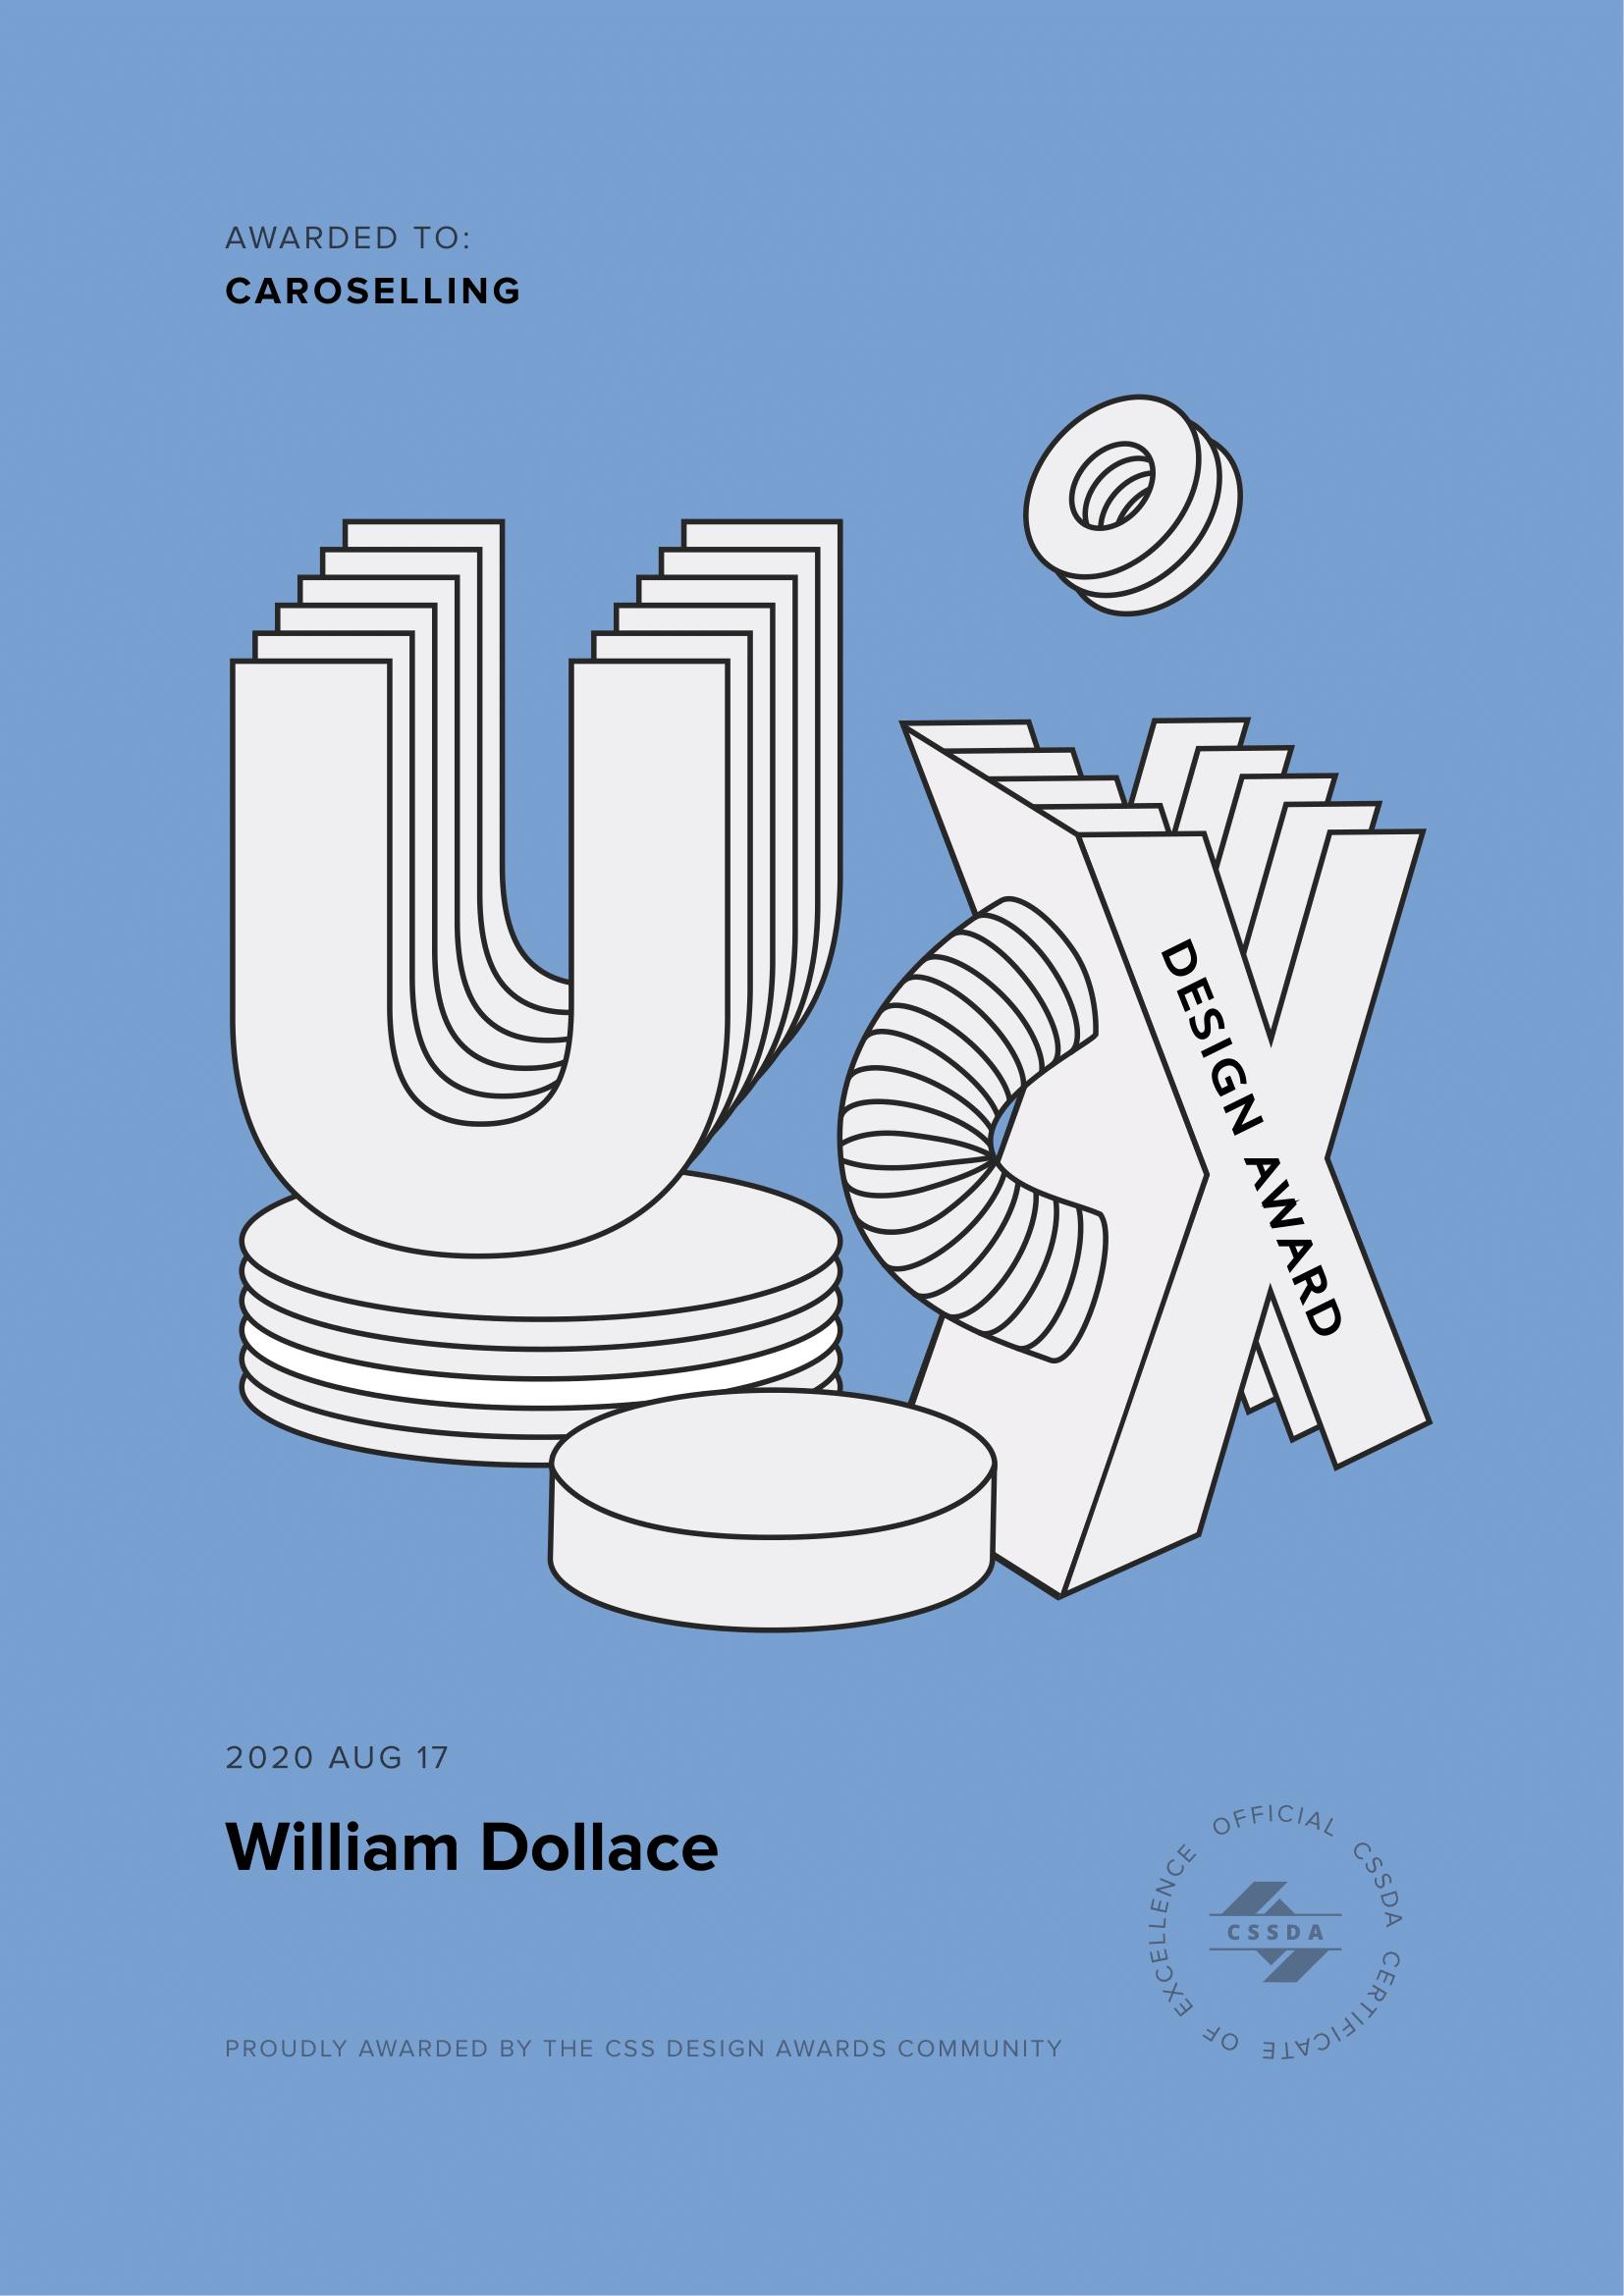 william dollace | premio | awards | sito web | portfolio Caroselling